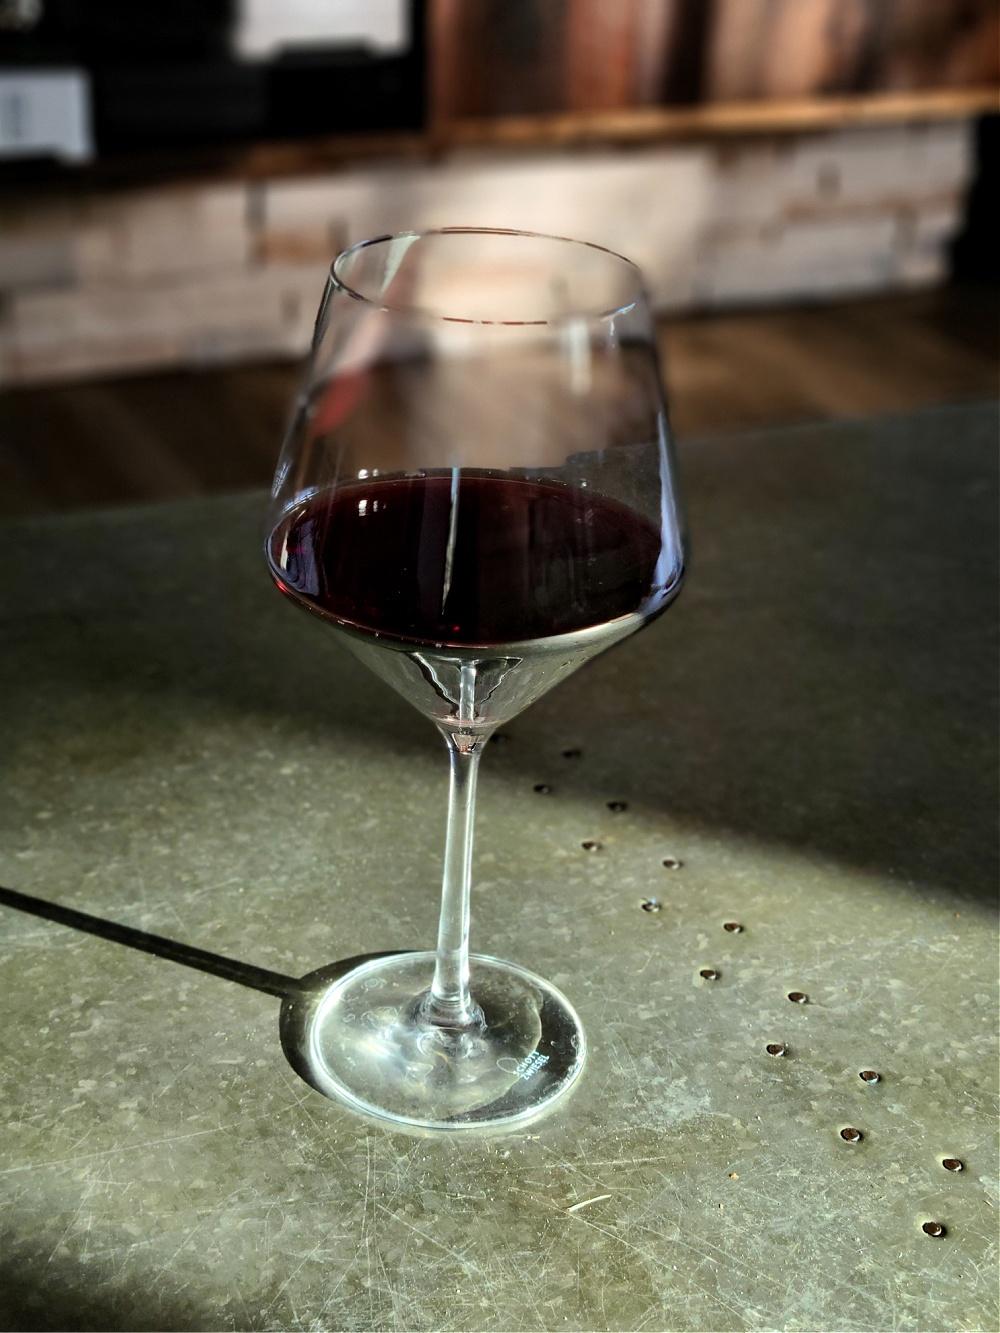 Learn about Cabernet Sauvignon wine